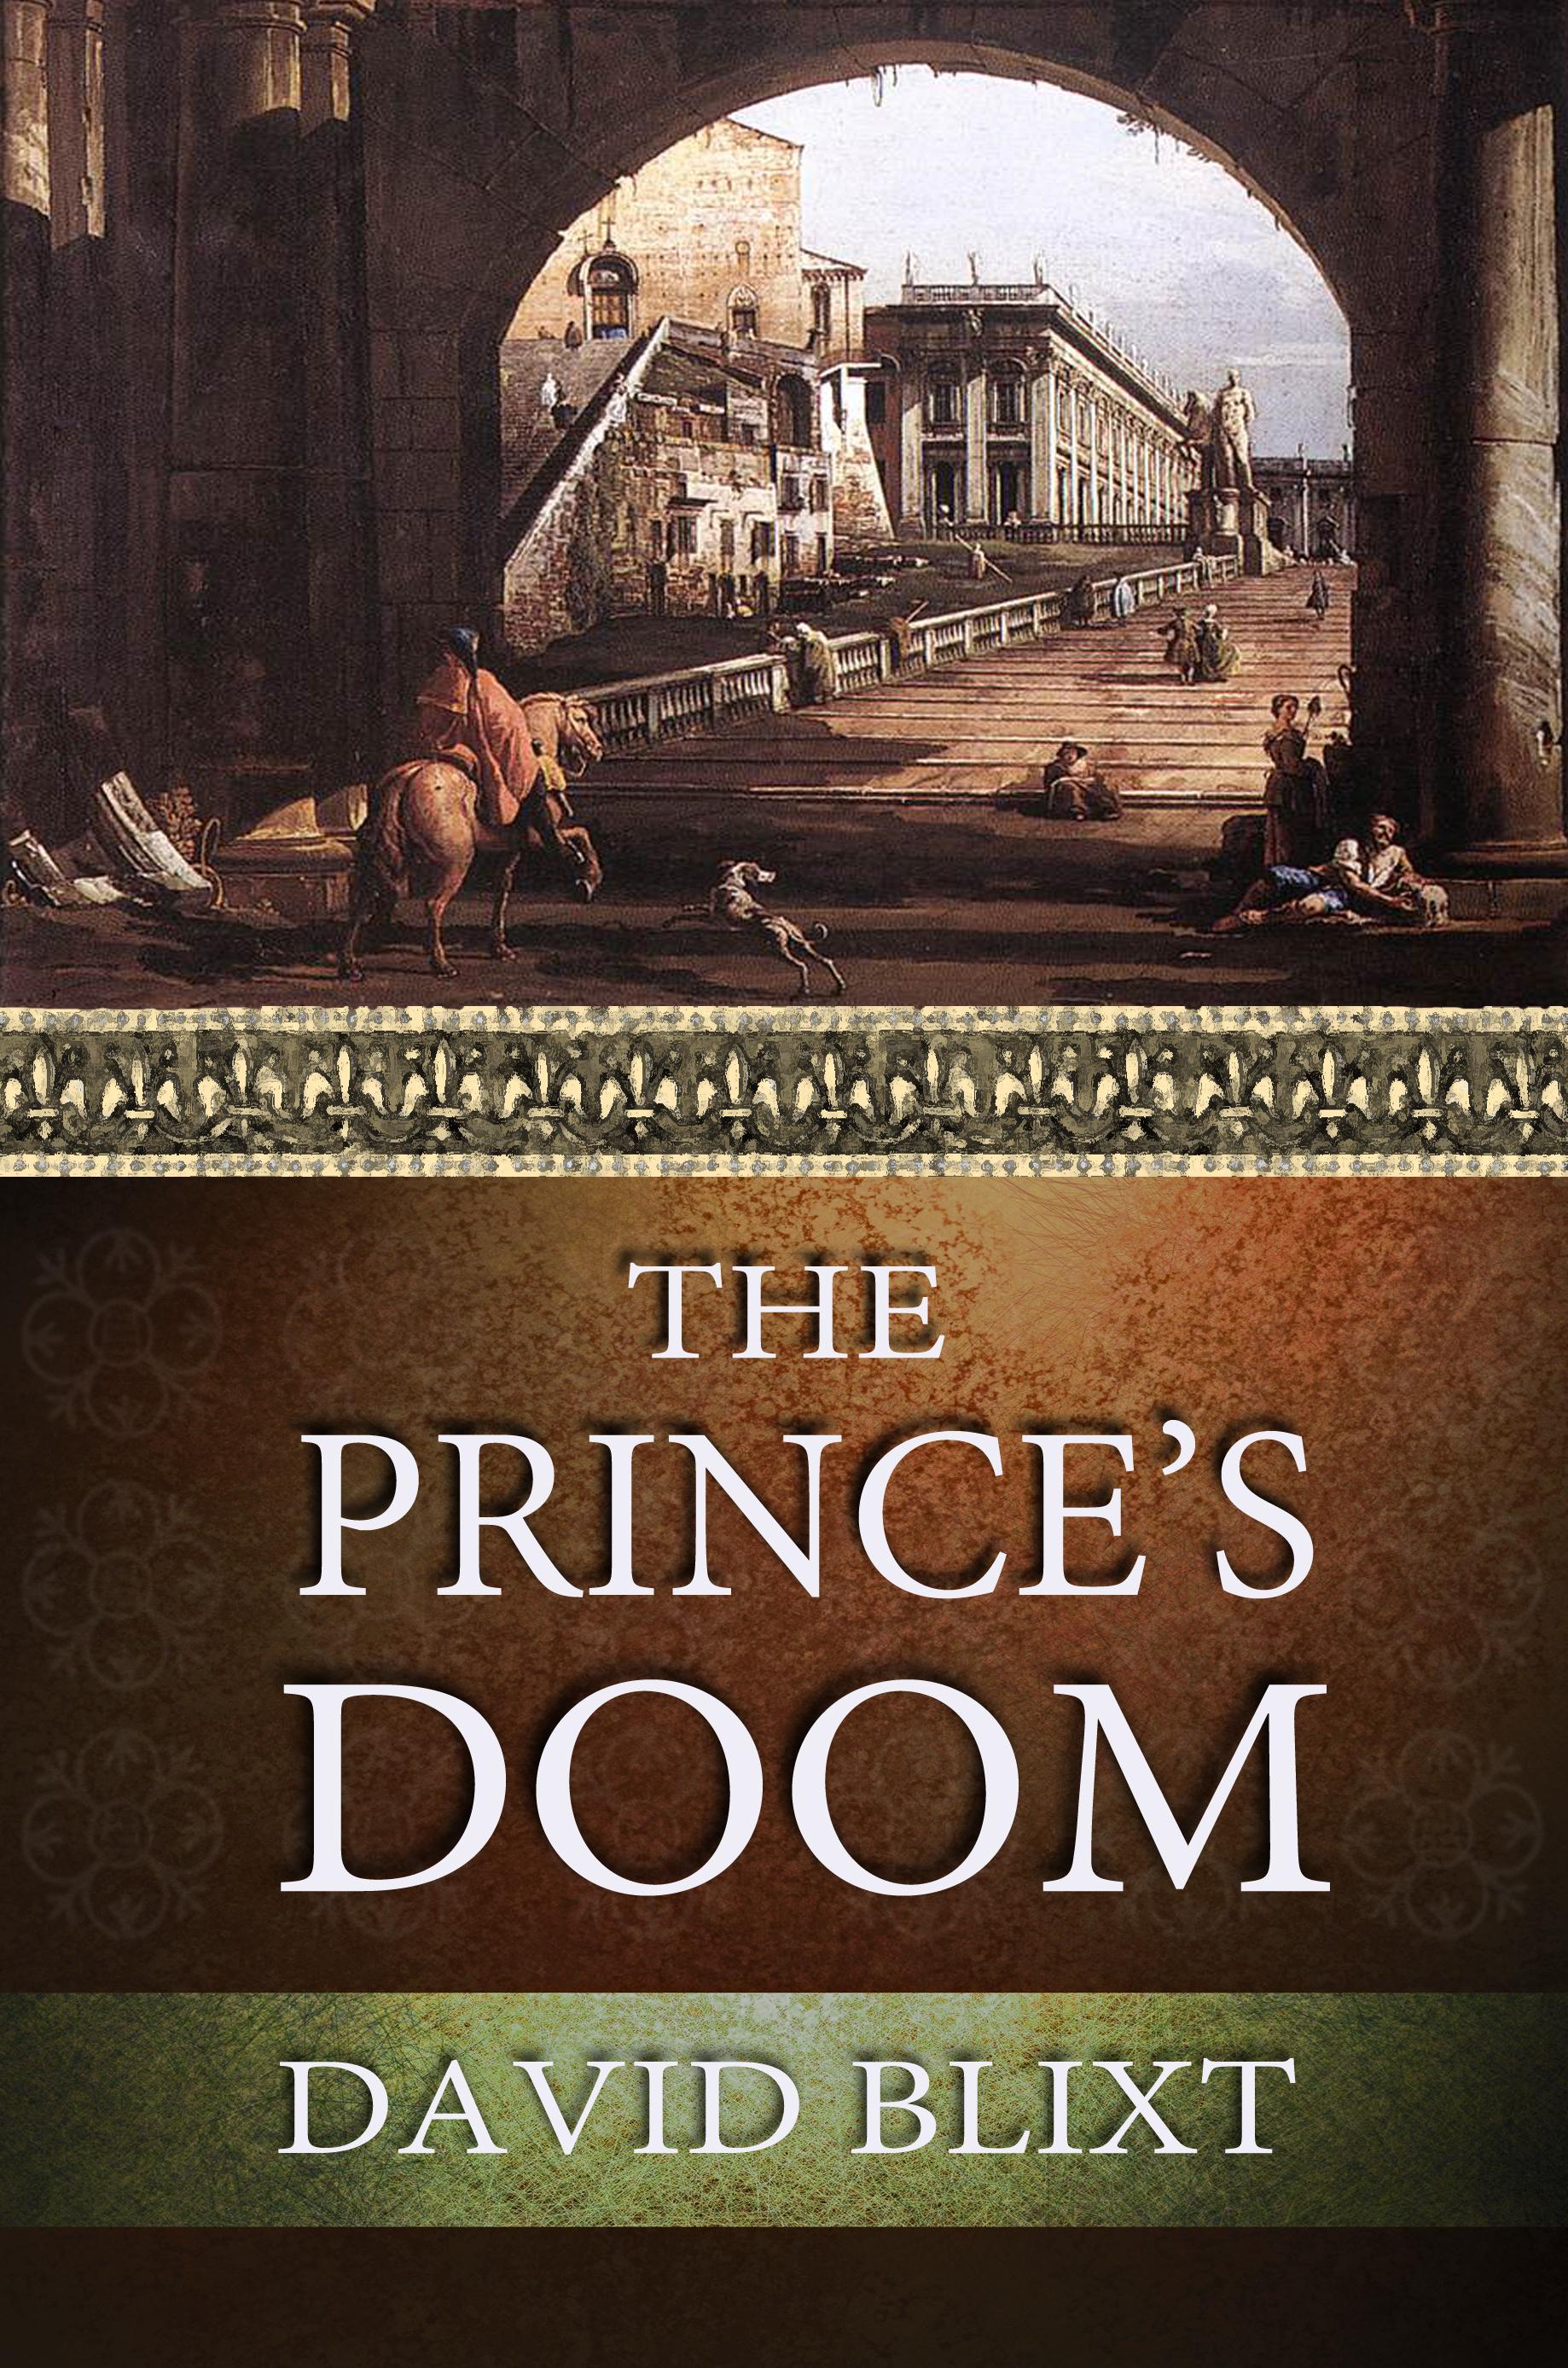 02_The Prince's Doom